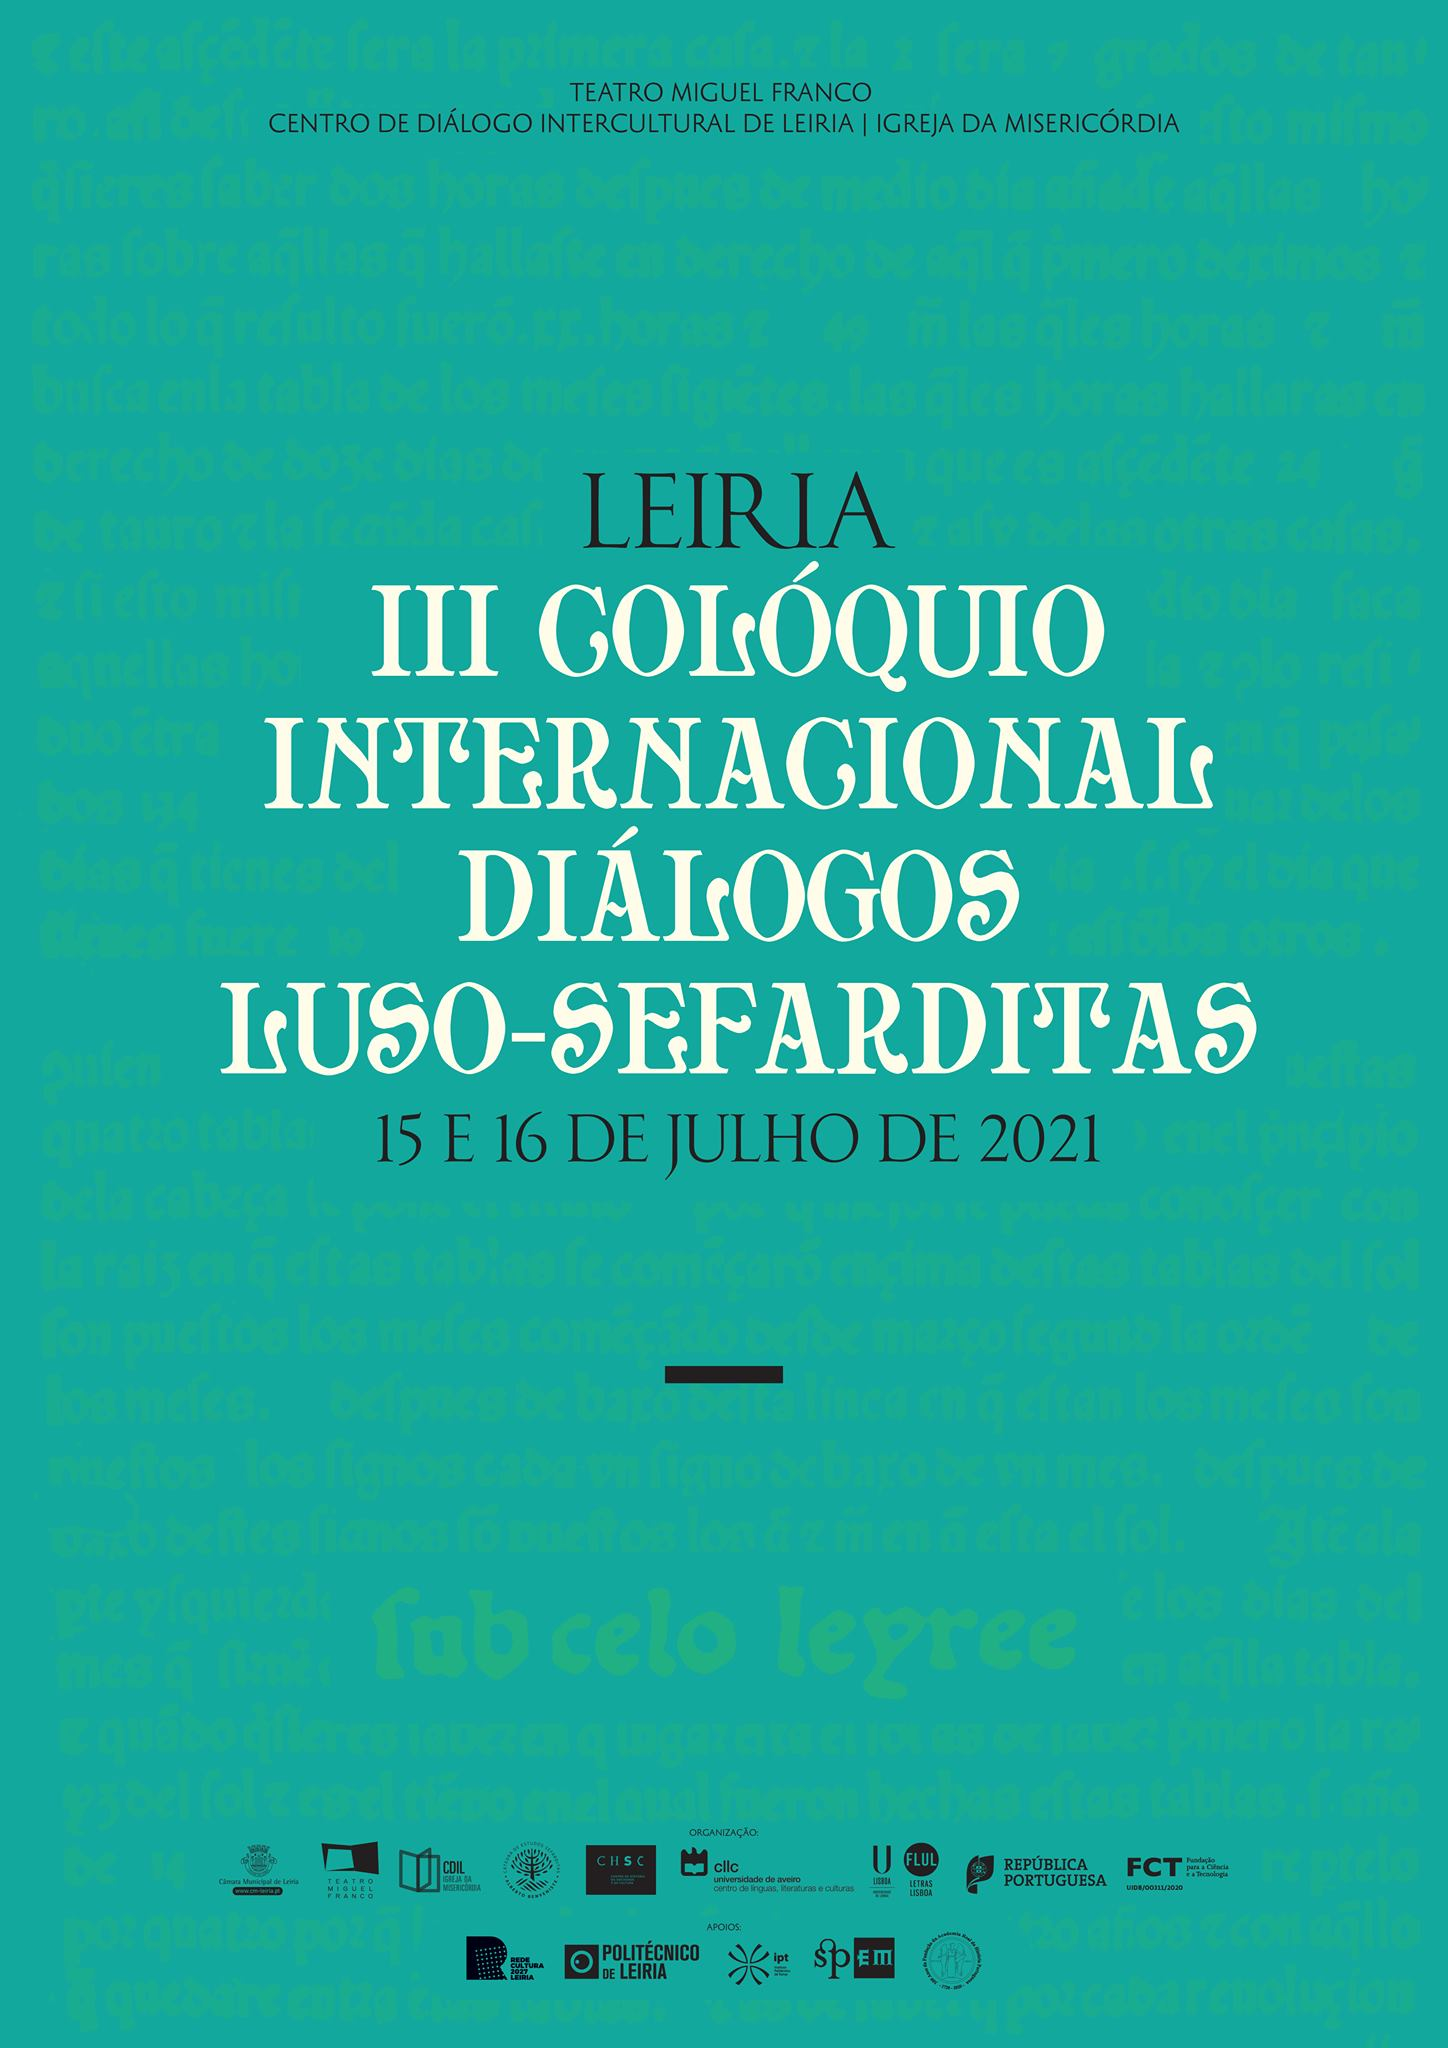 II Colóquio Internacional Diálogos Luso-Sefarditas